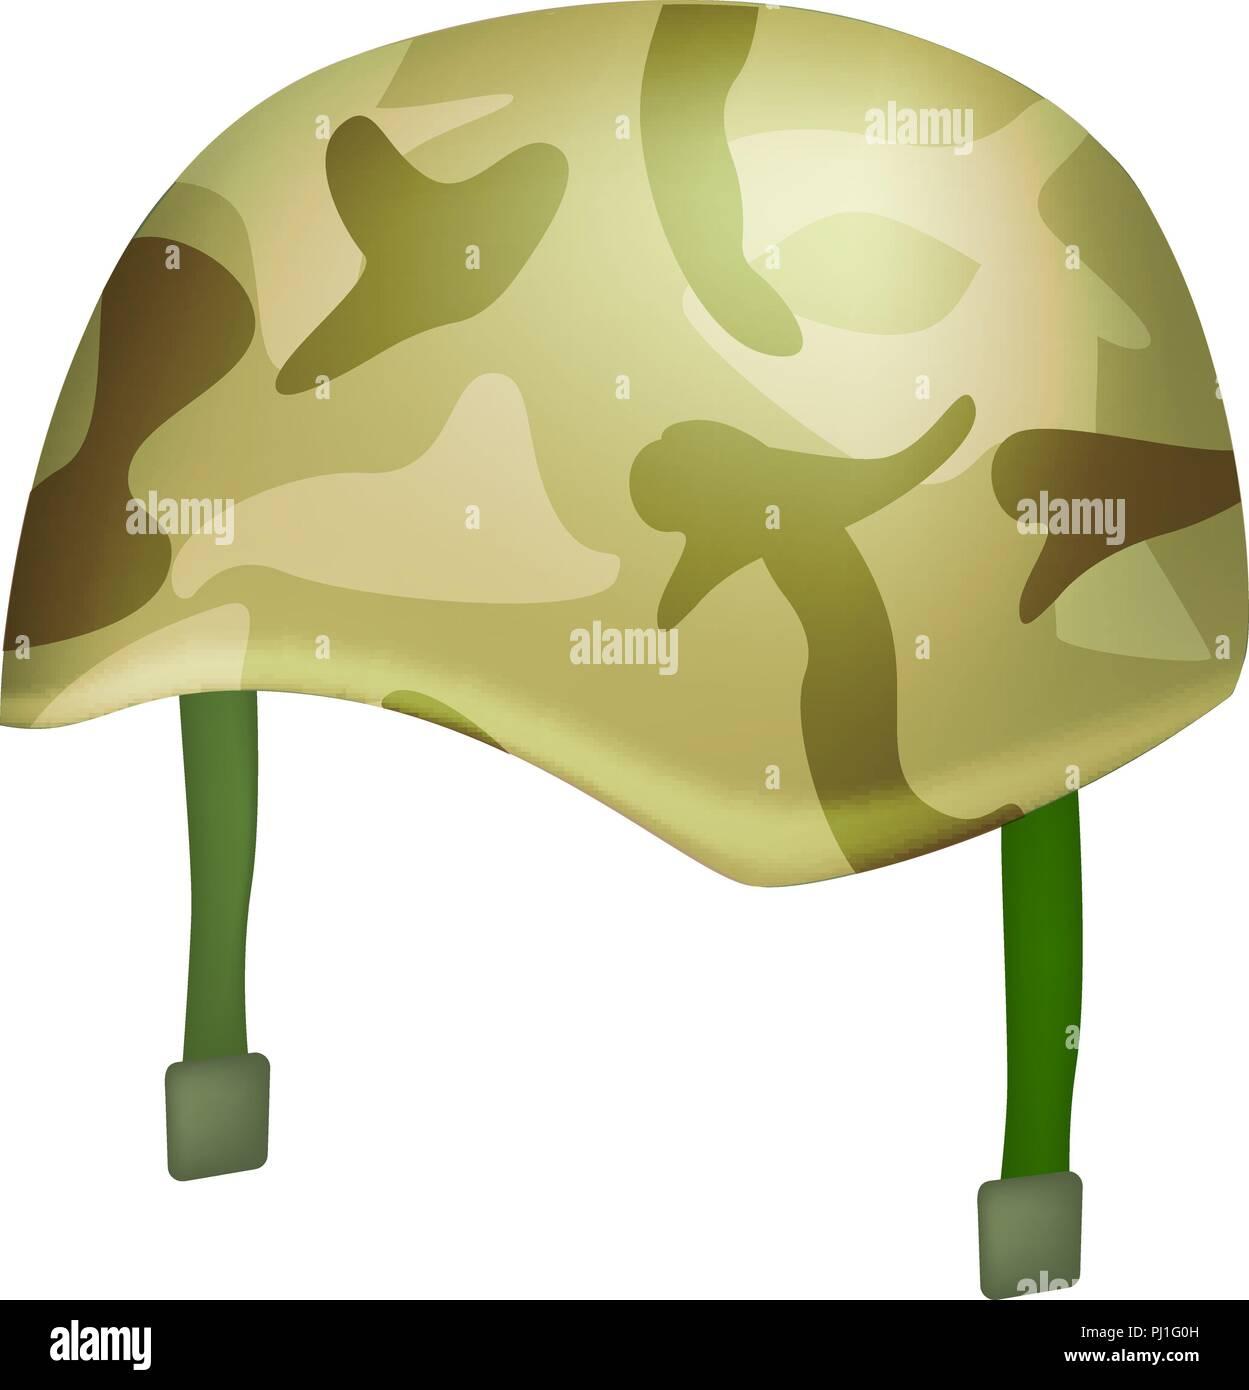 Camo helmet mockup, realistic style - Stock Image